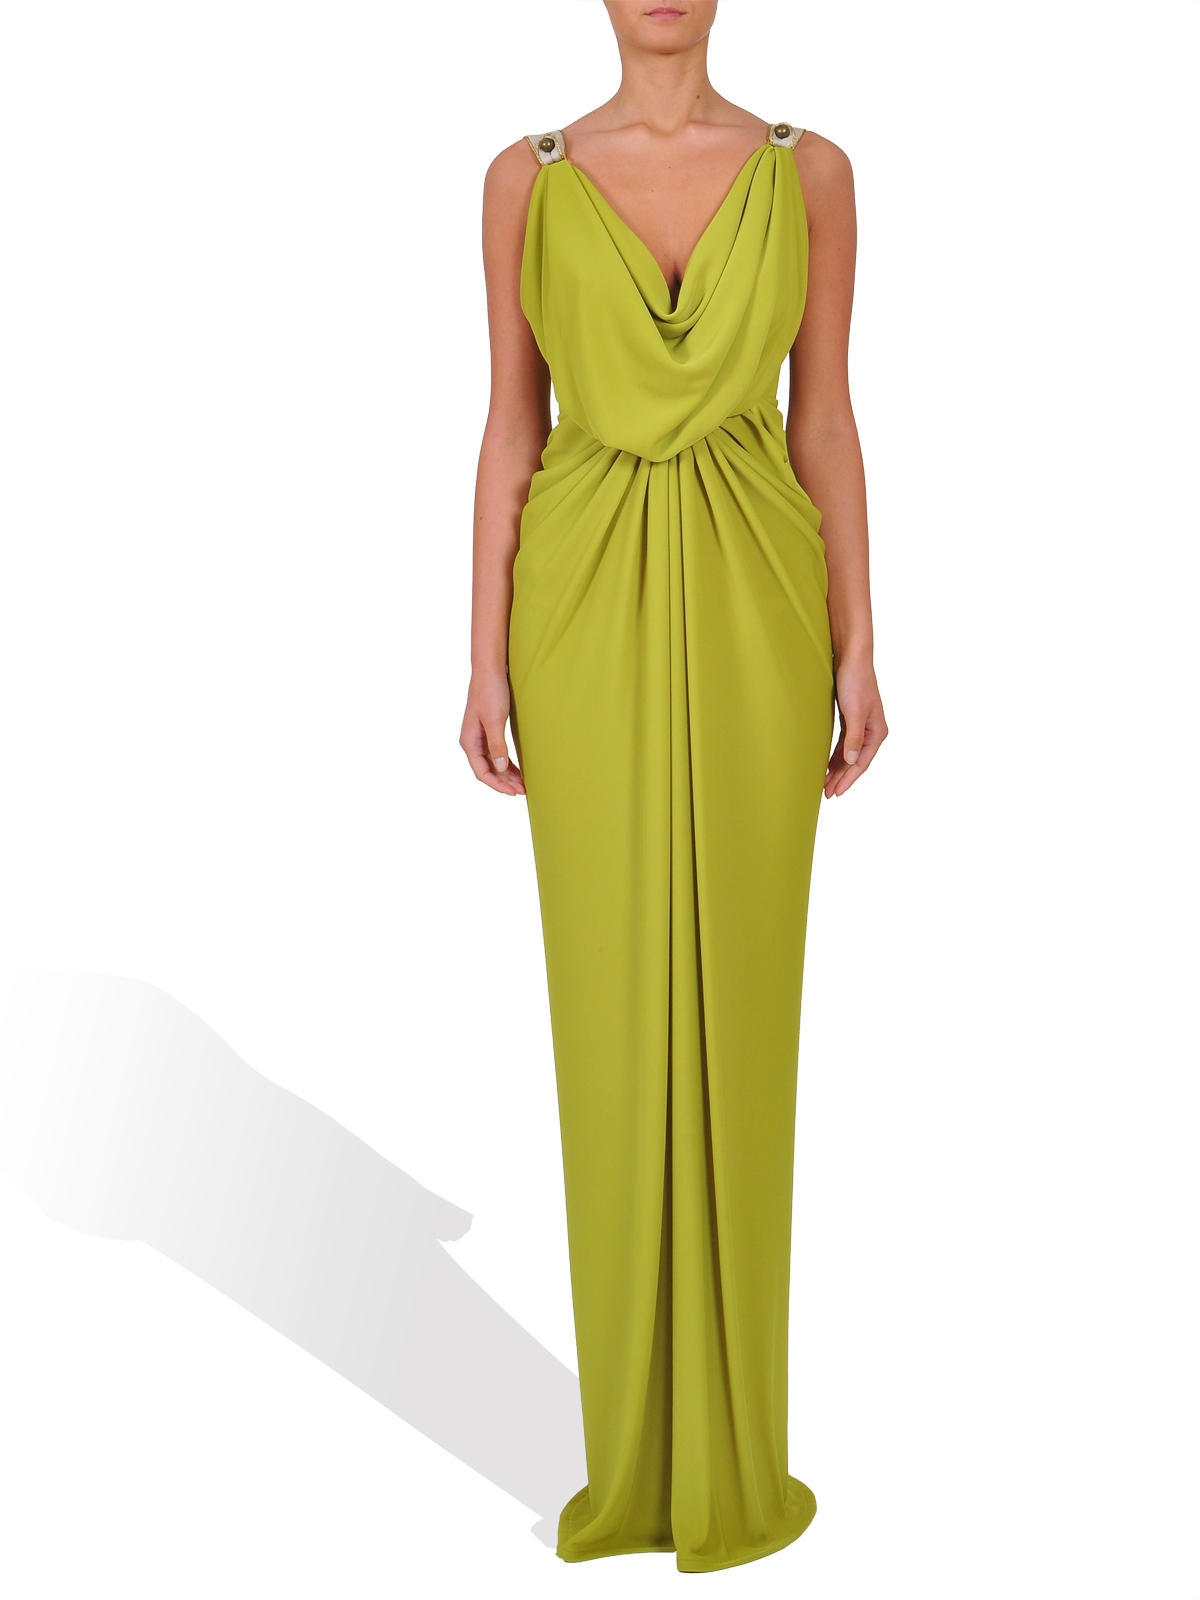 Long draped dress by MIRELA DIACONU